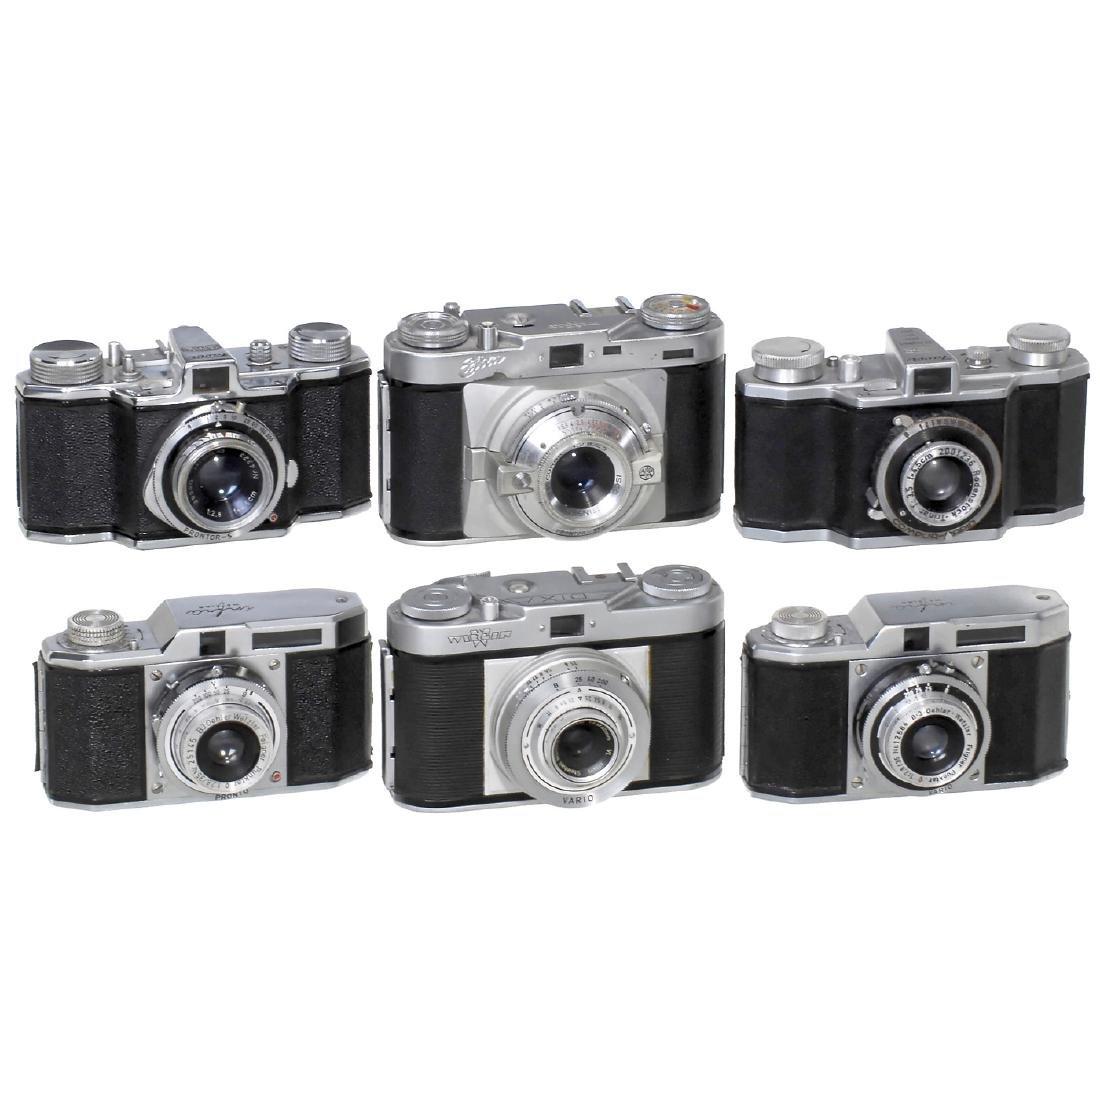 "2 ""Favor"", 2 ""Infra"" and 2 ""Edixa"" Cameras"